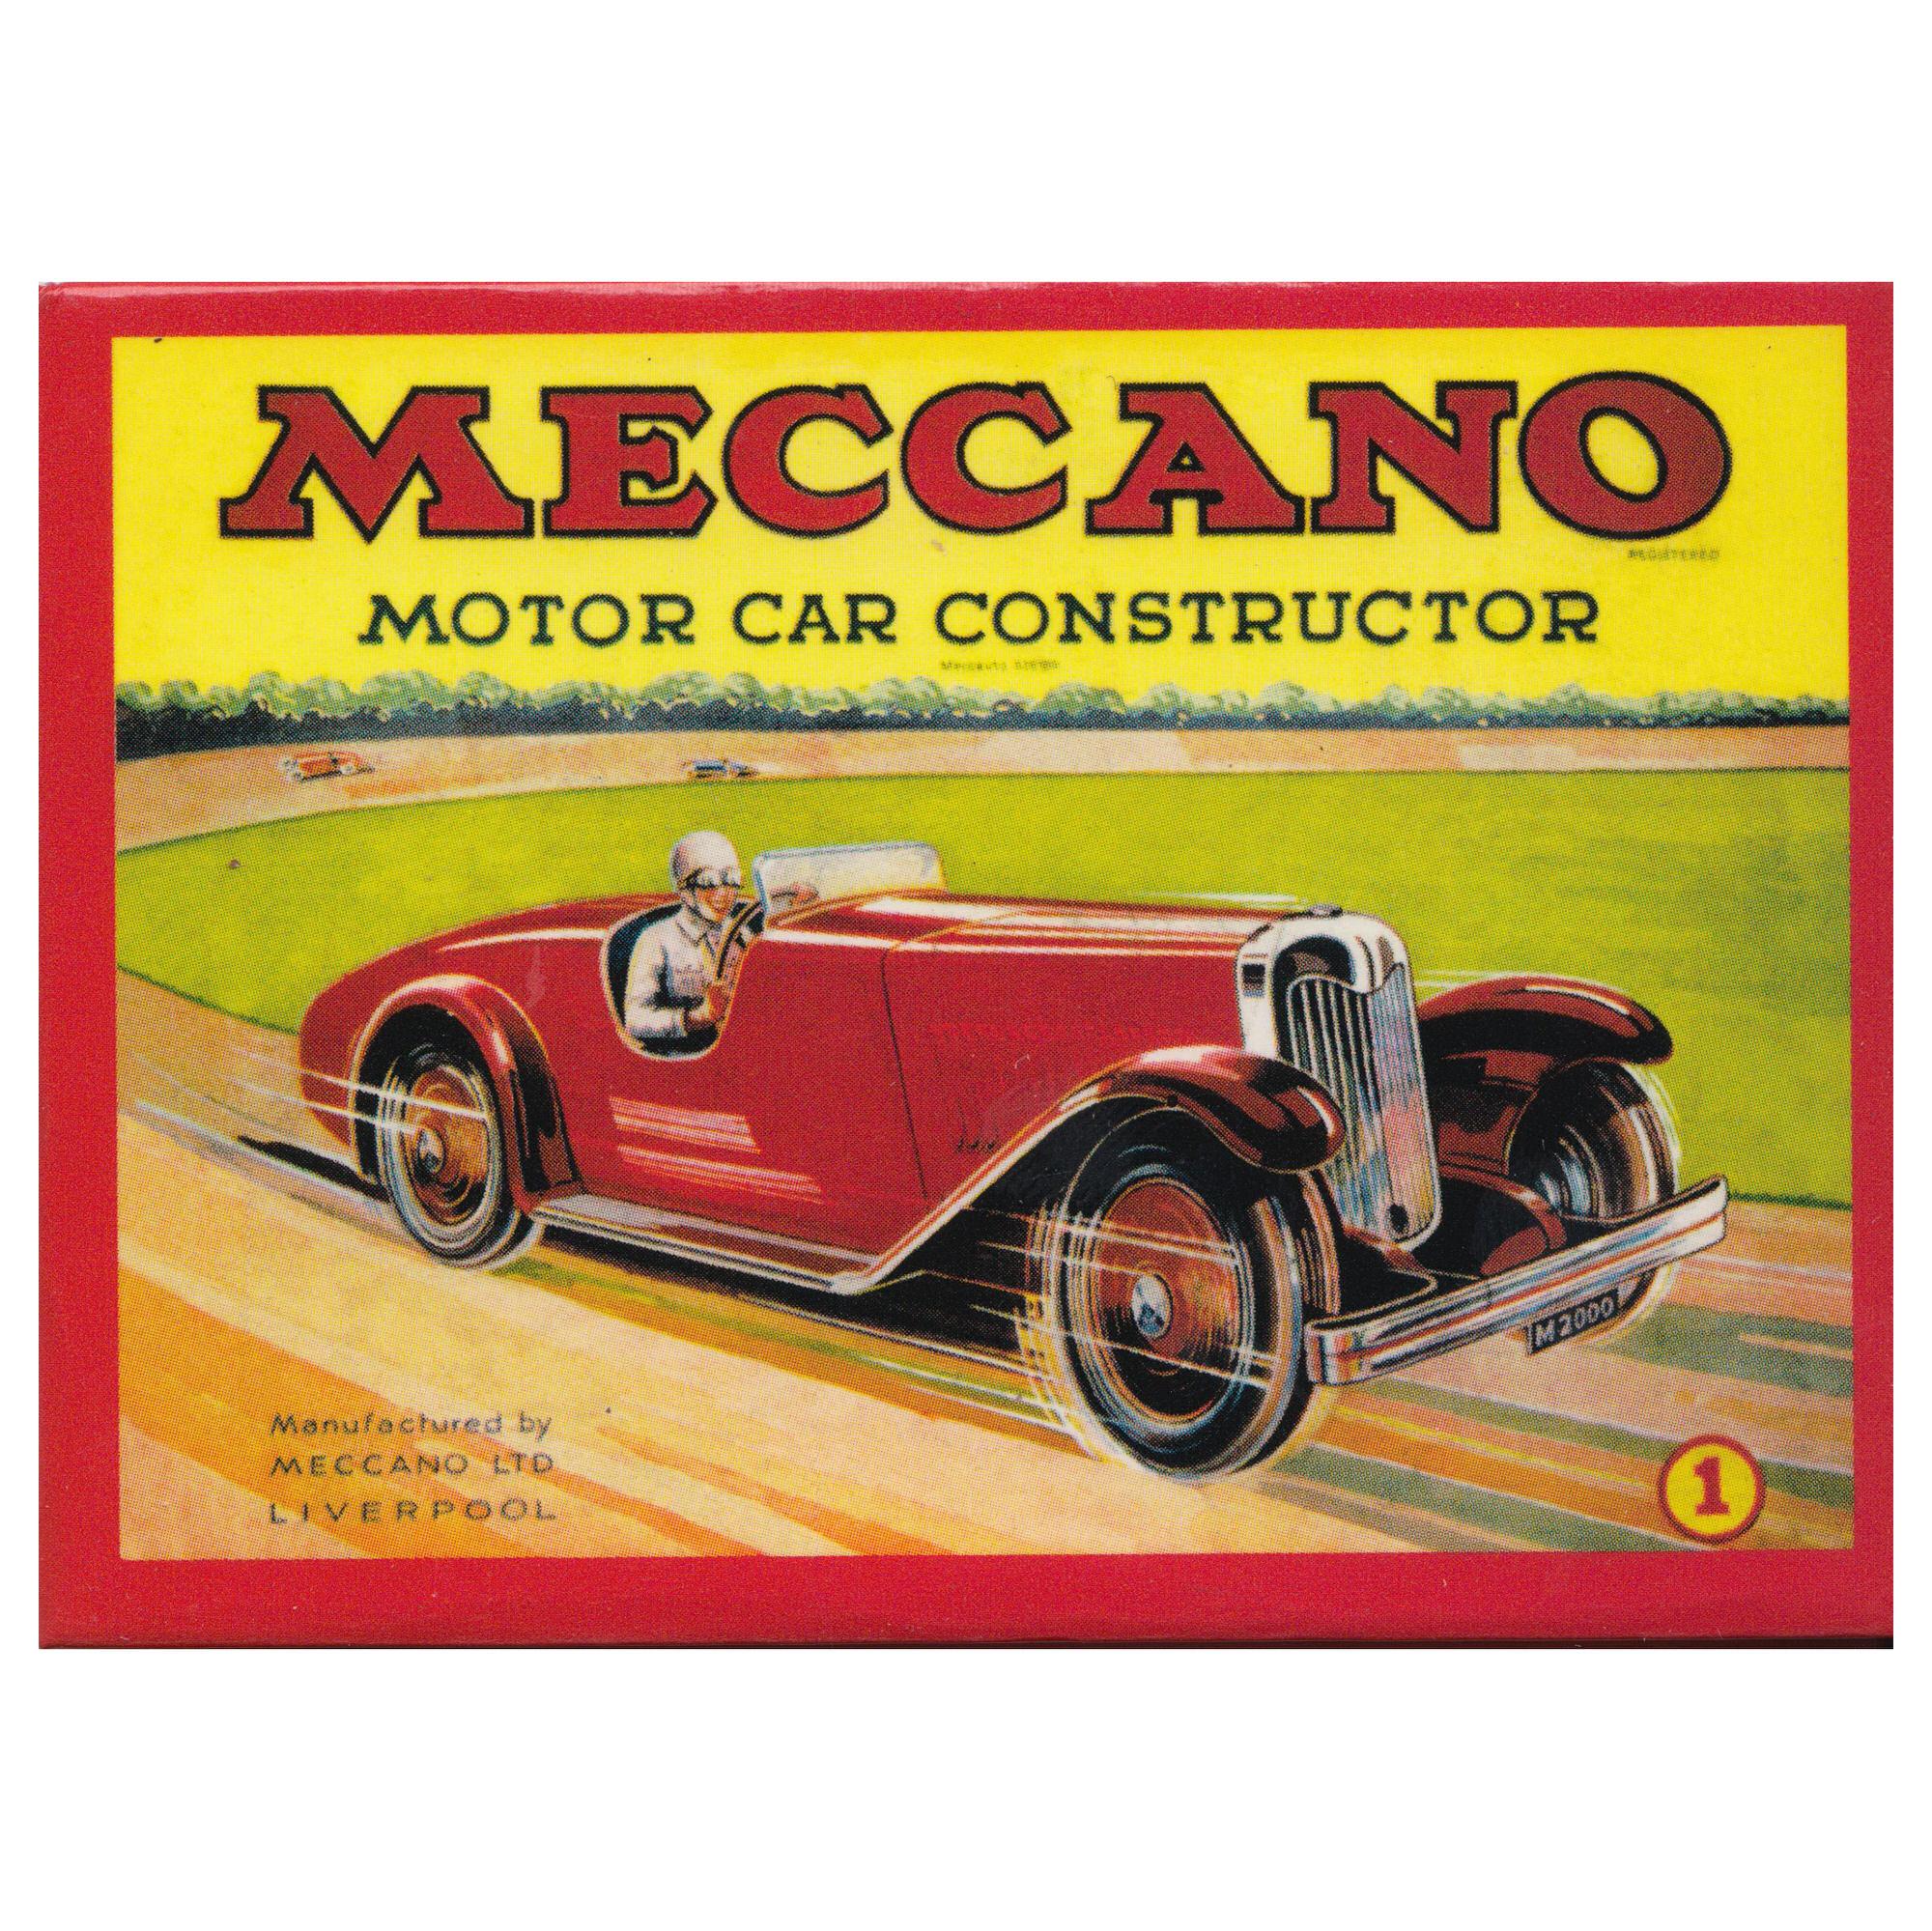 New Meccano Motor Car Fridge Magnet Vintage Retro Opie Kit Memorabilia Racing Ebay